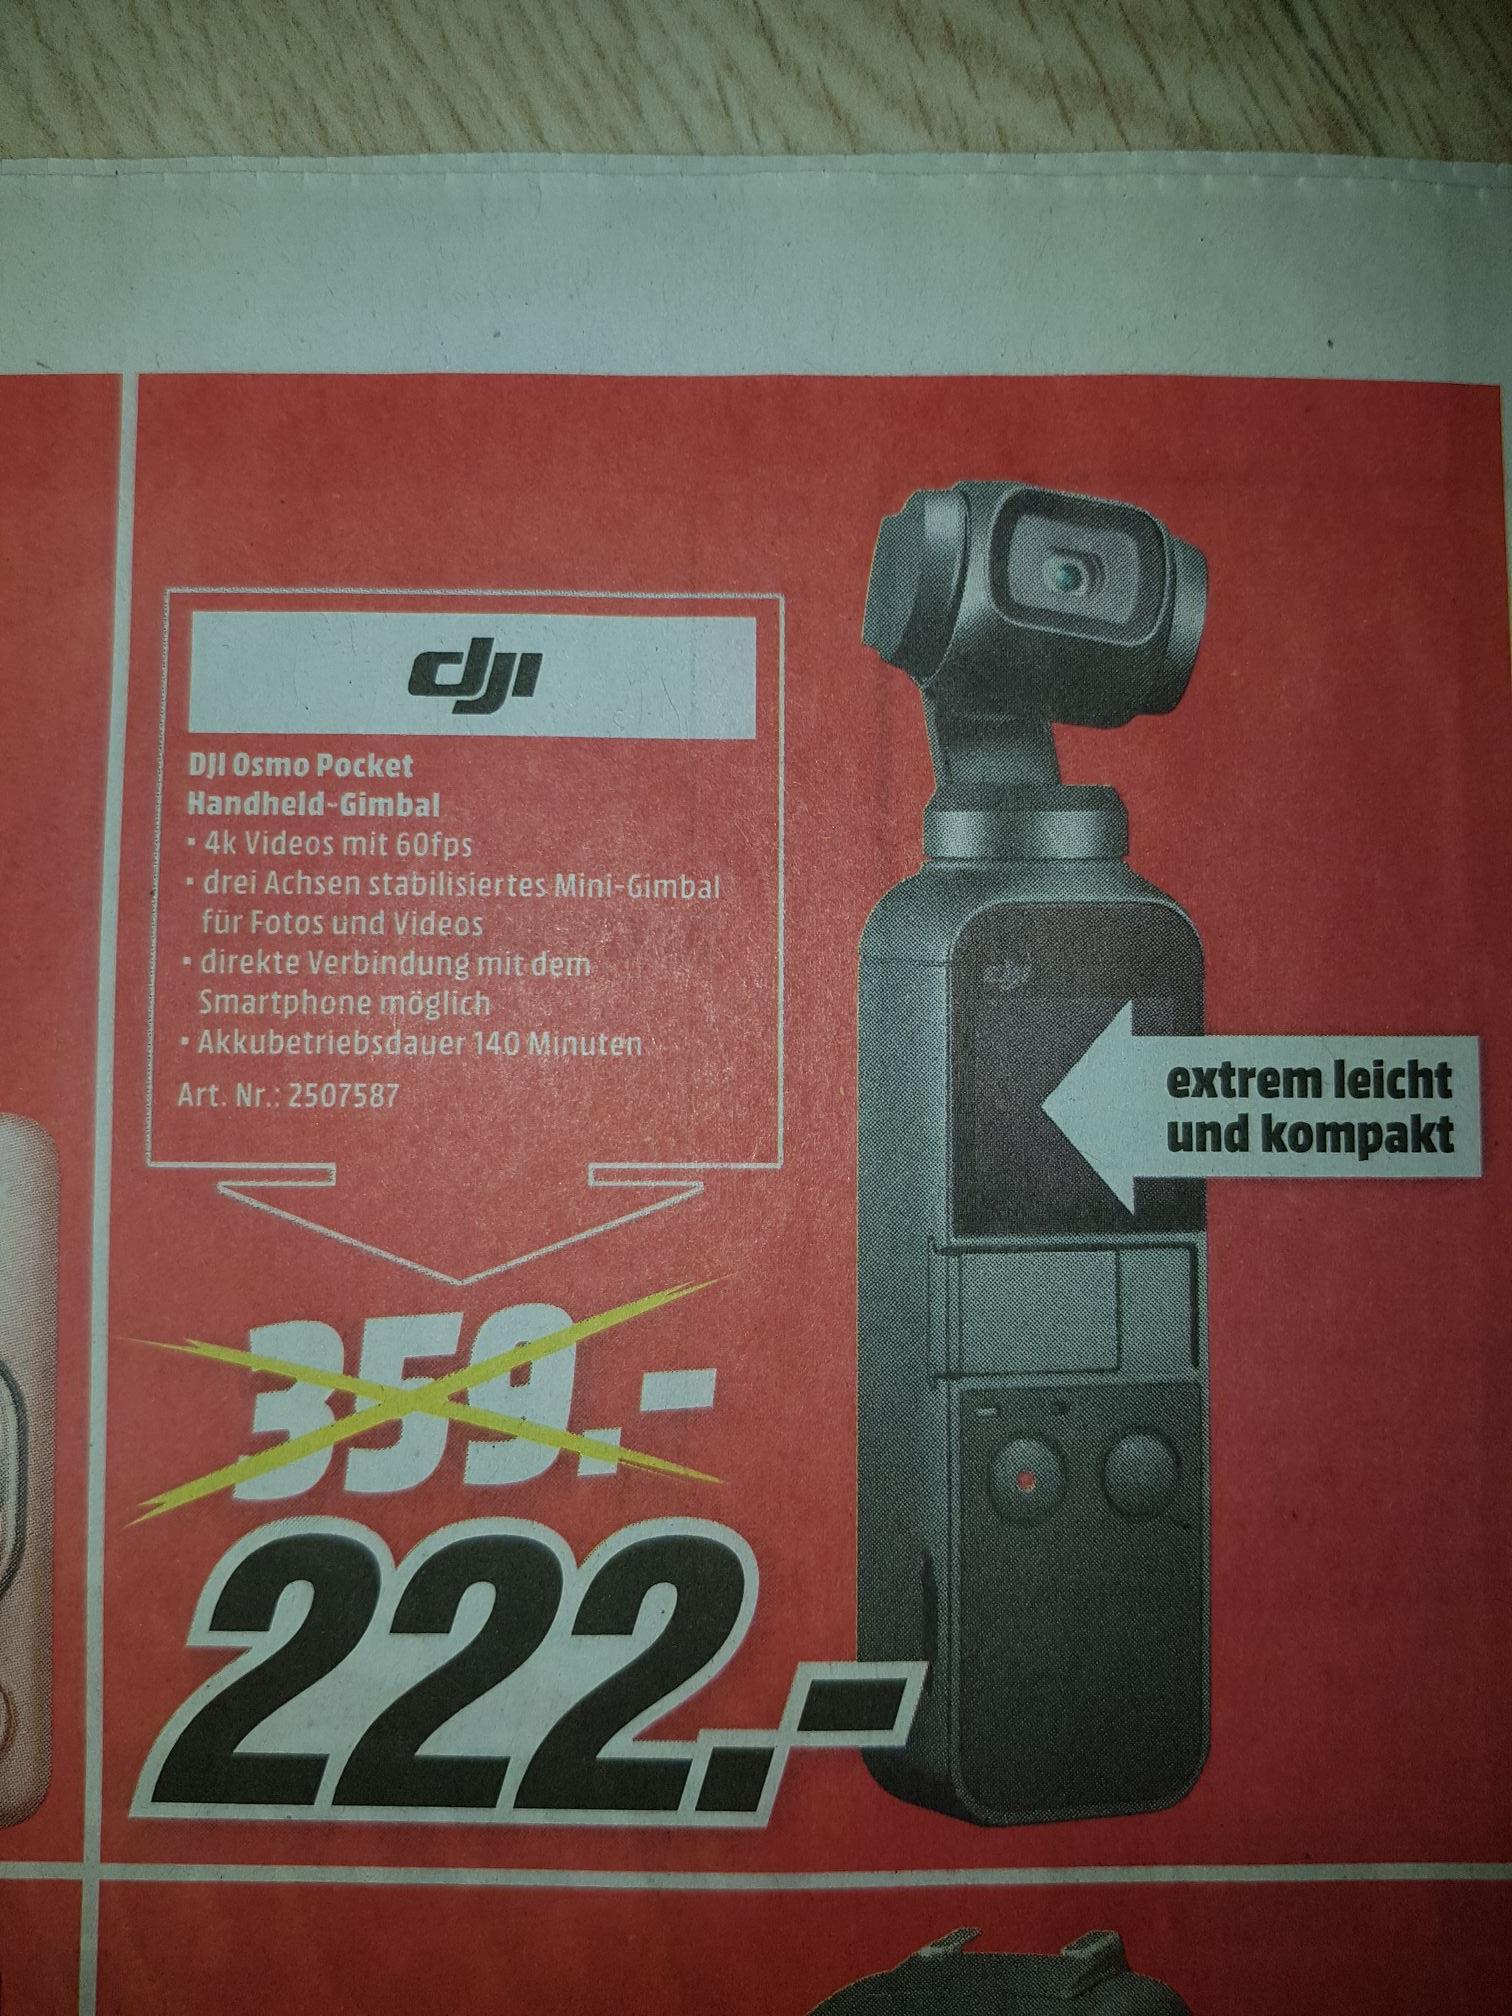 [Lokal] Rostock Mediamarkt Brinkmannsdorf - Dji Osmo Pocket für 222€